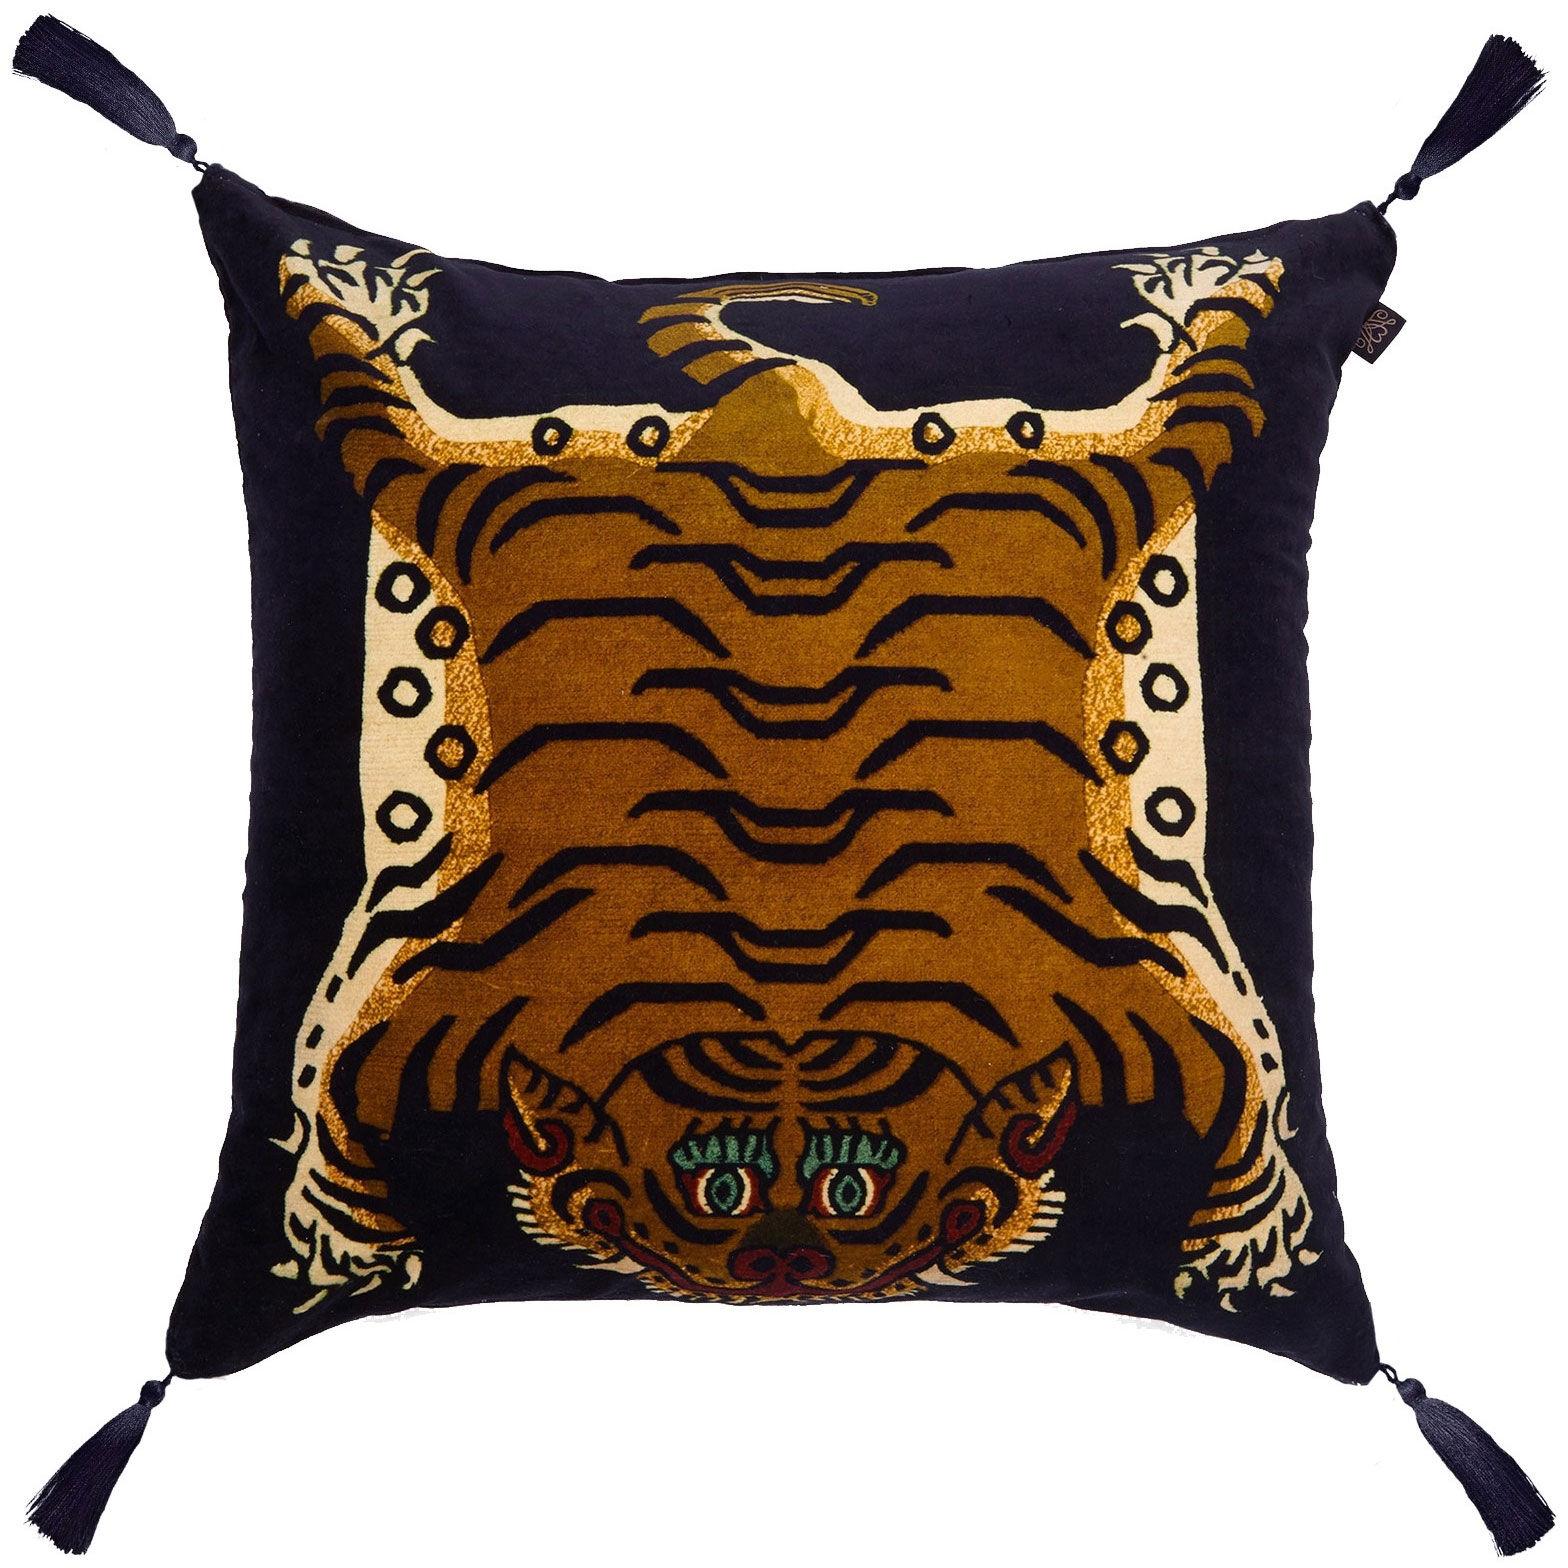 House of Hackney Saber Cushion Large, Midnight